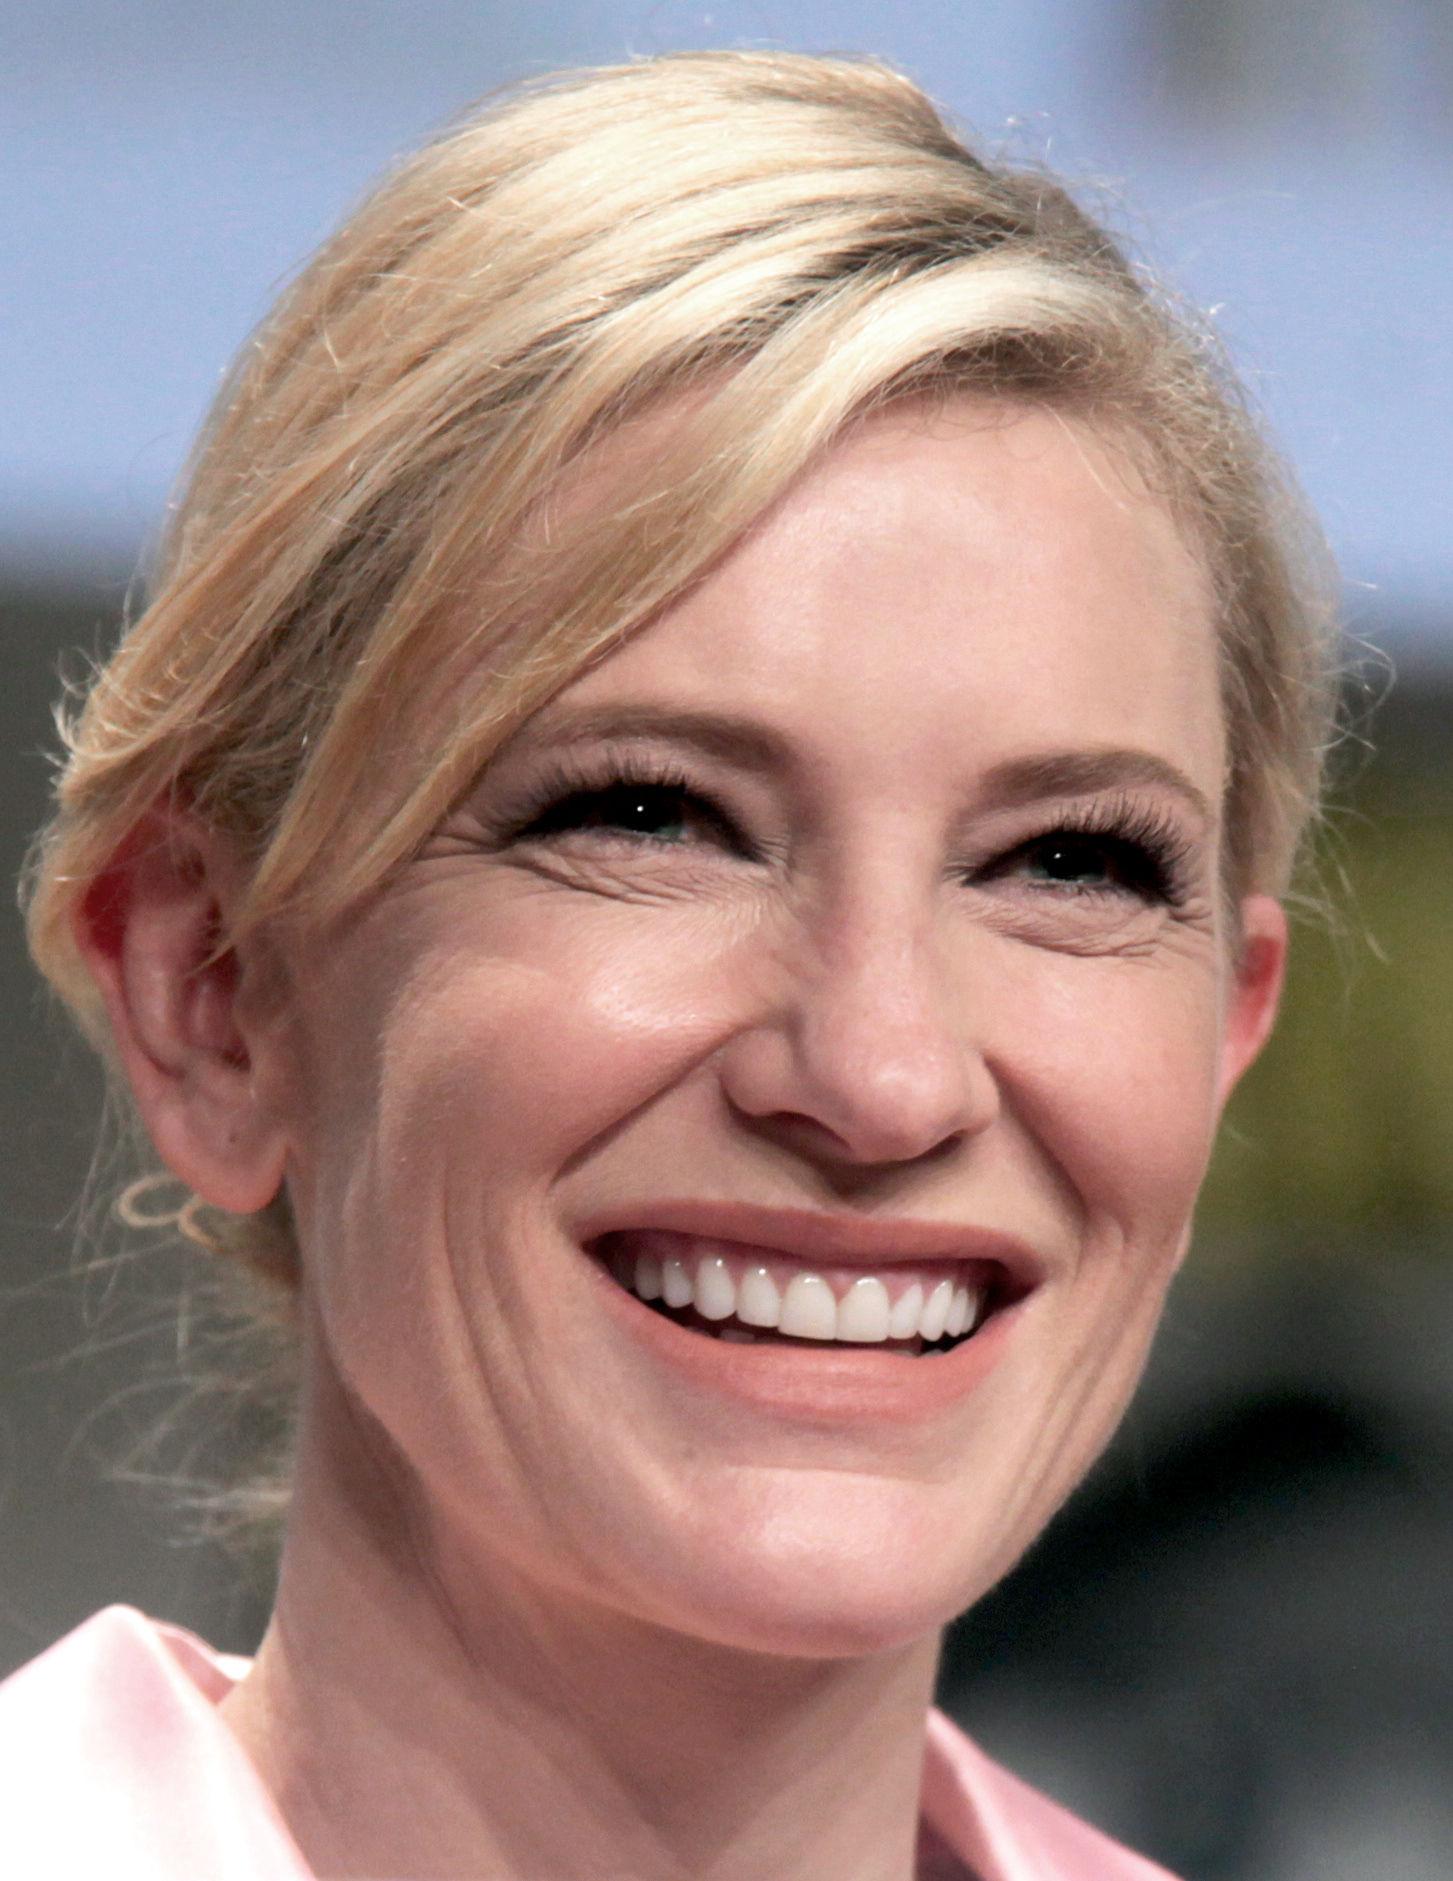 Photo of Cate Blanchett: Australian actress